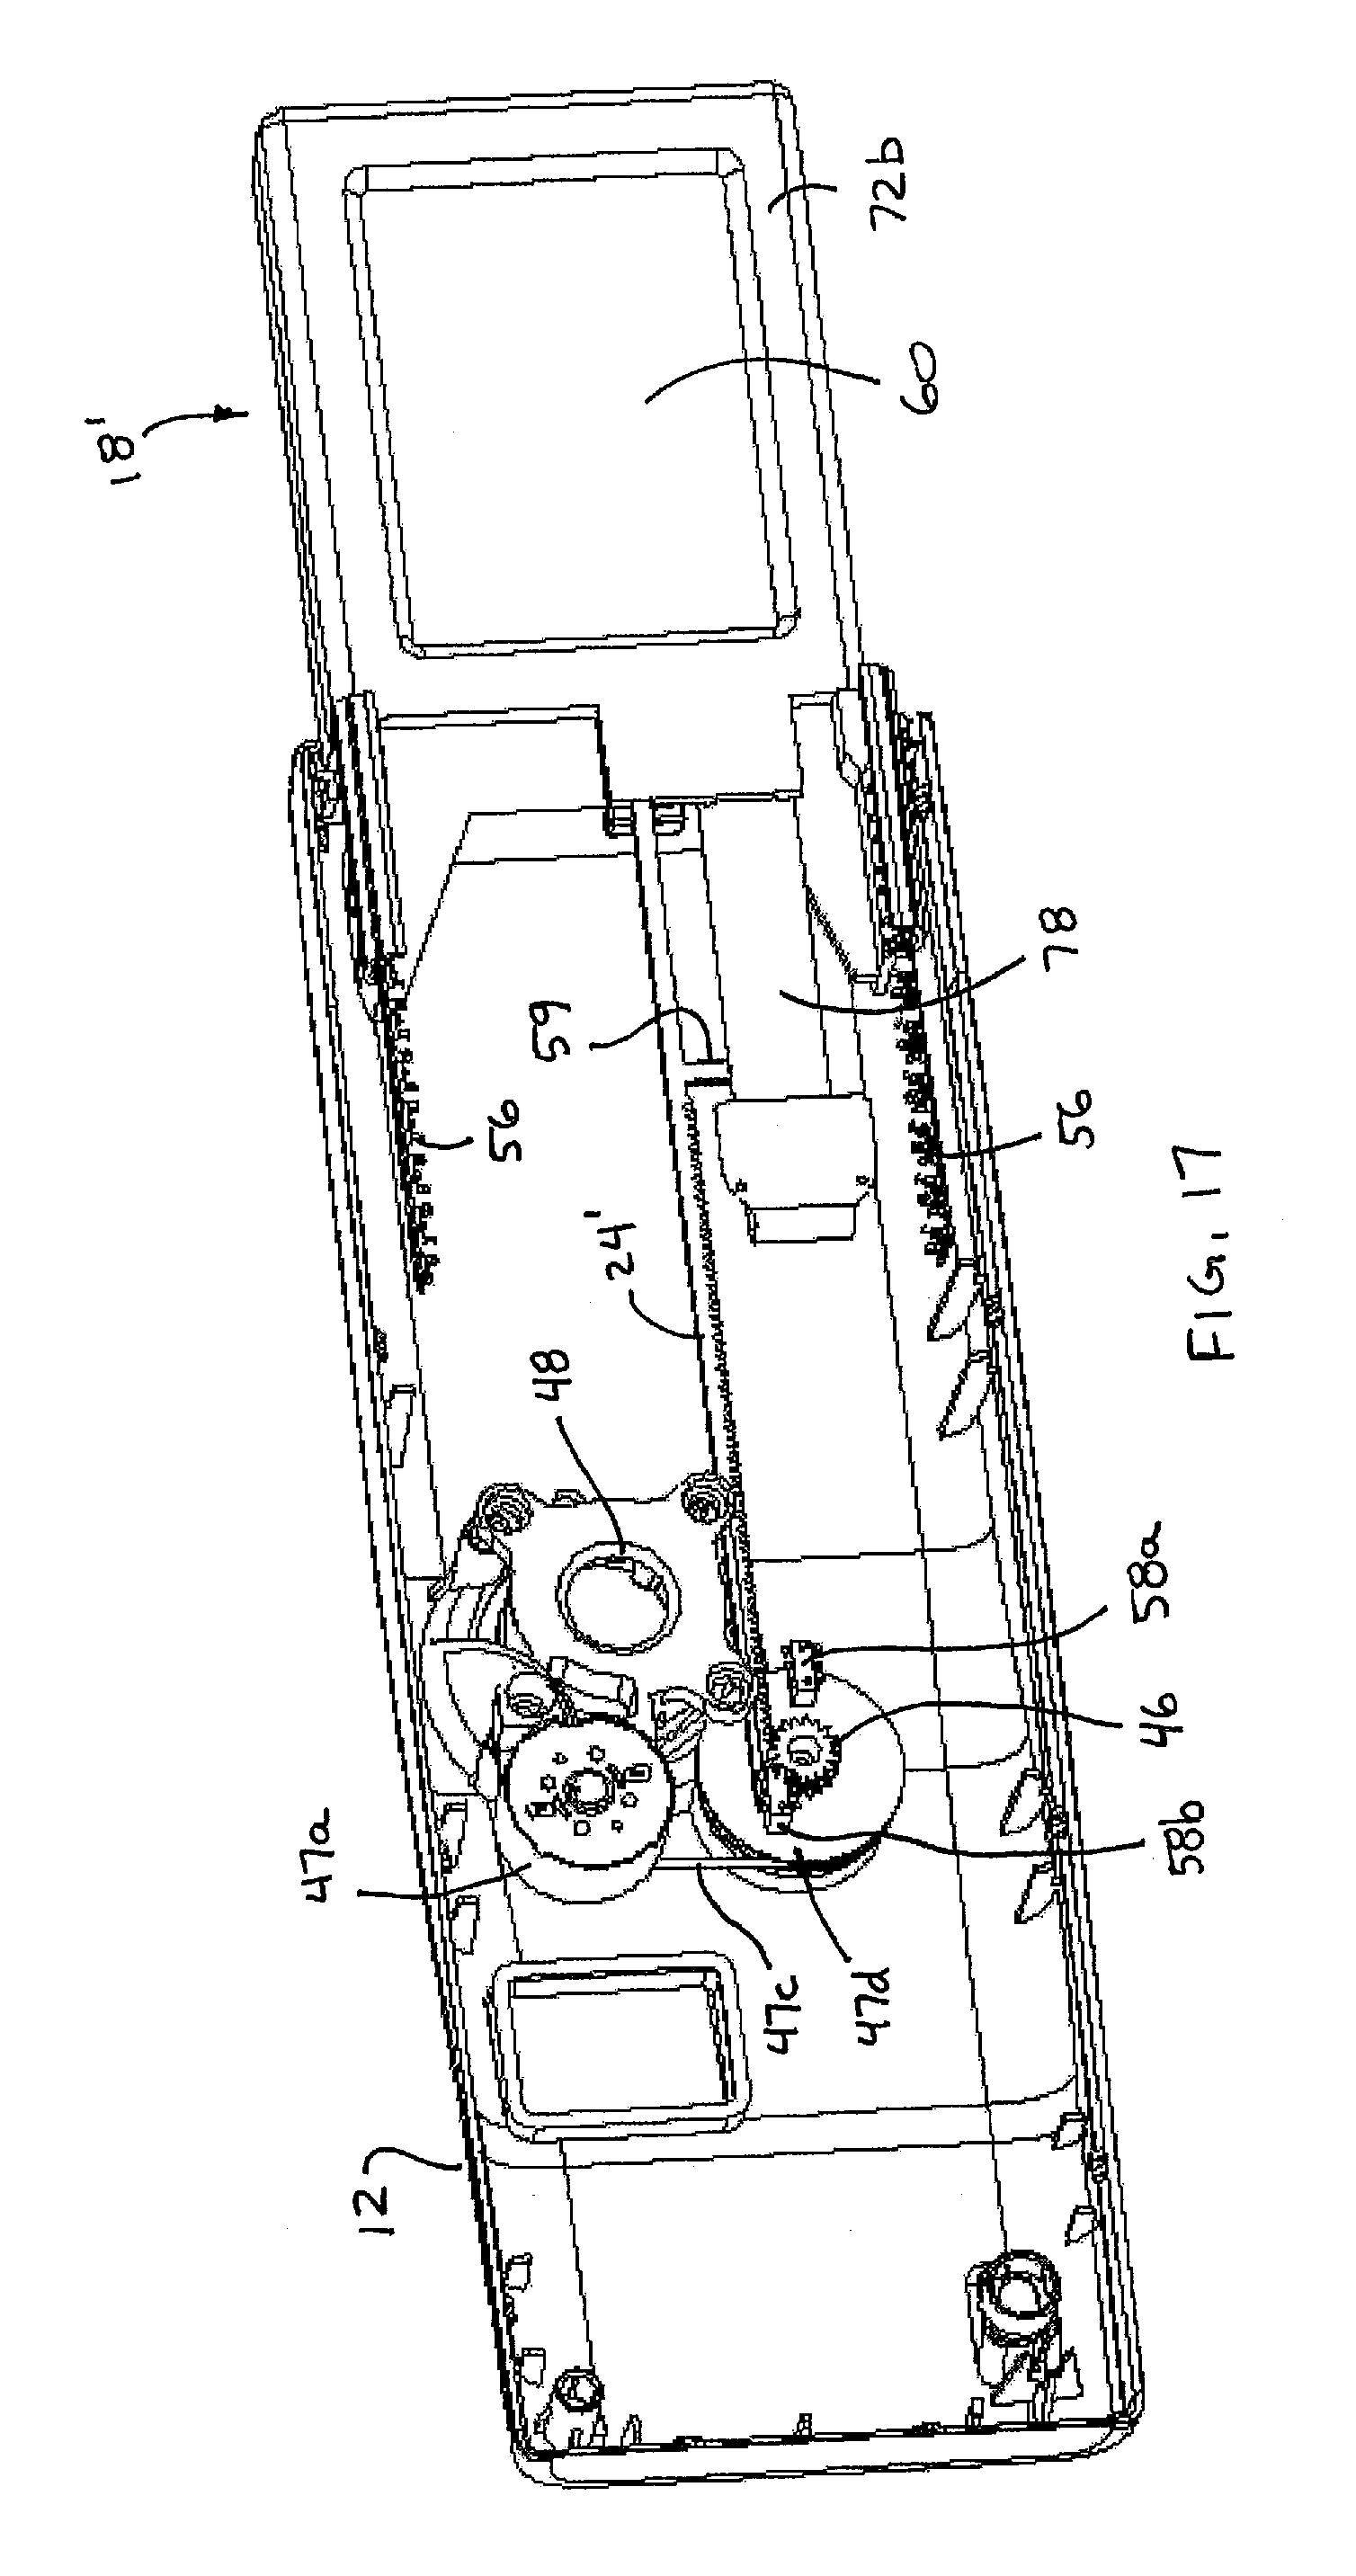 Wiring Diagram Les Paul Push Pull moreover 1984 Oldsmobile Cutl Wiring Diagram furthermore  on 68 cutl wiring diagram